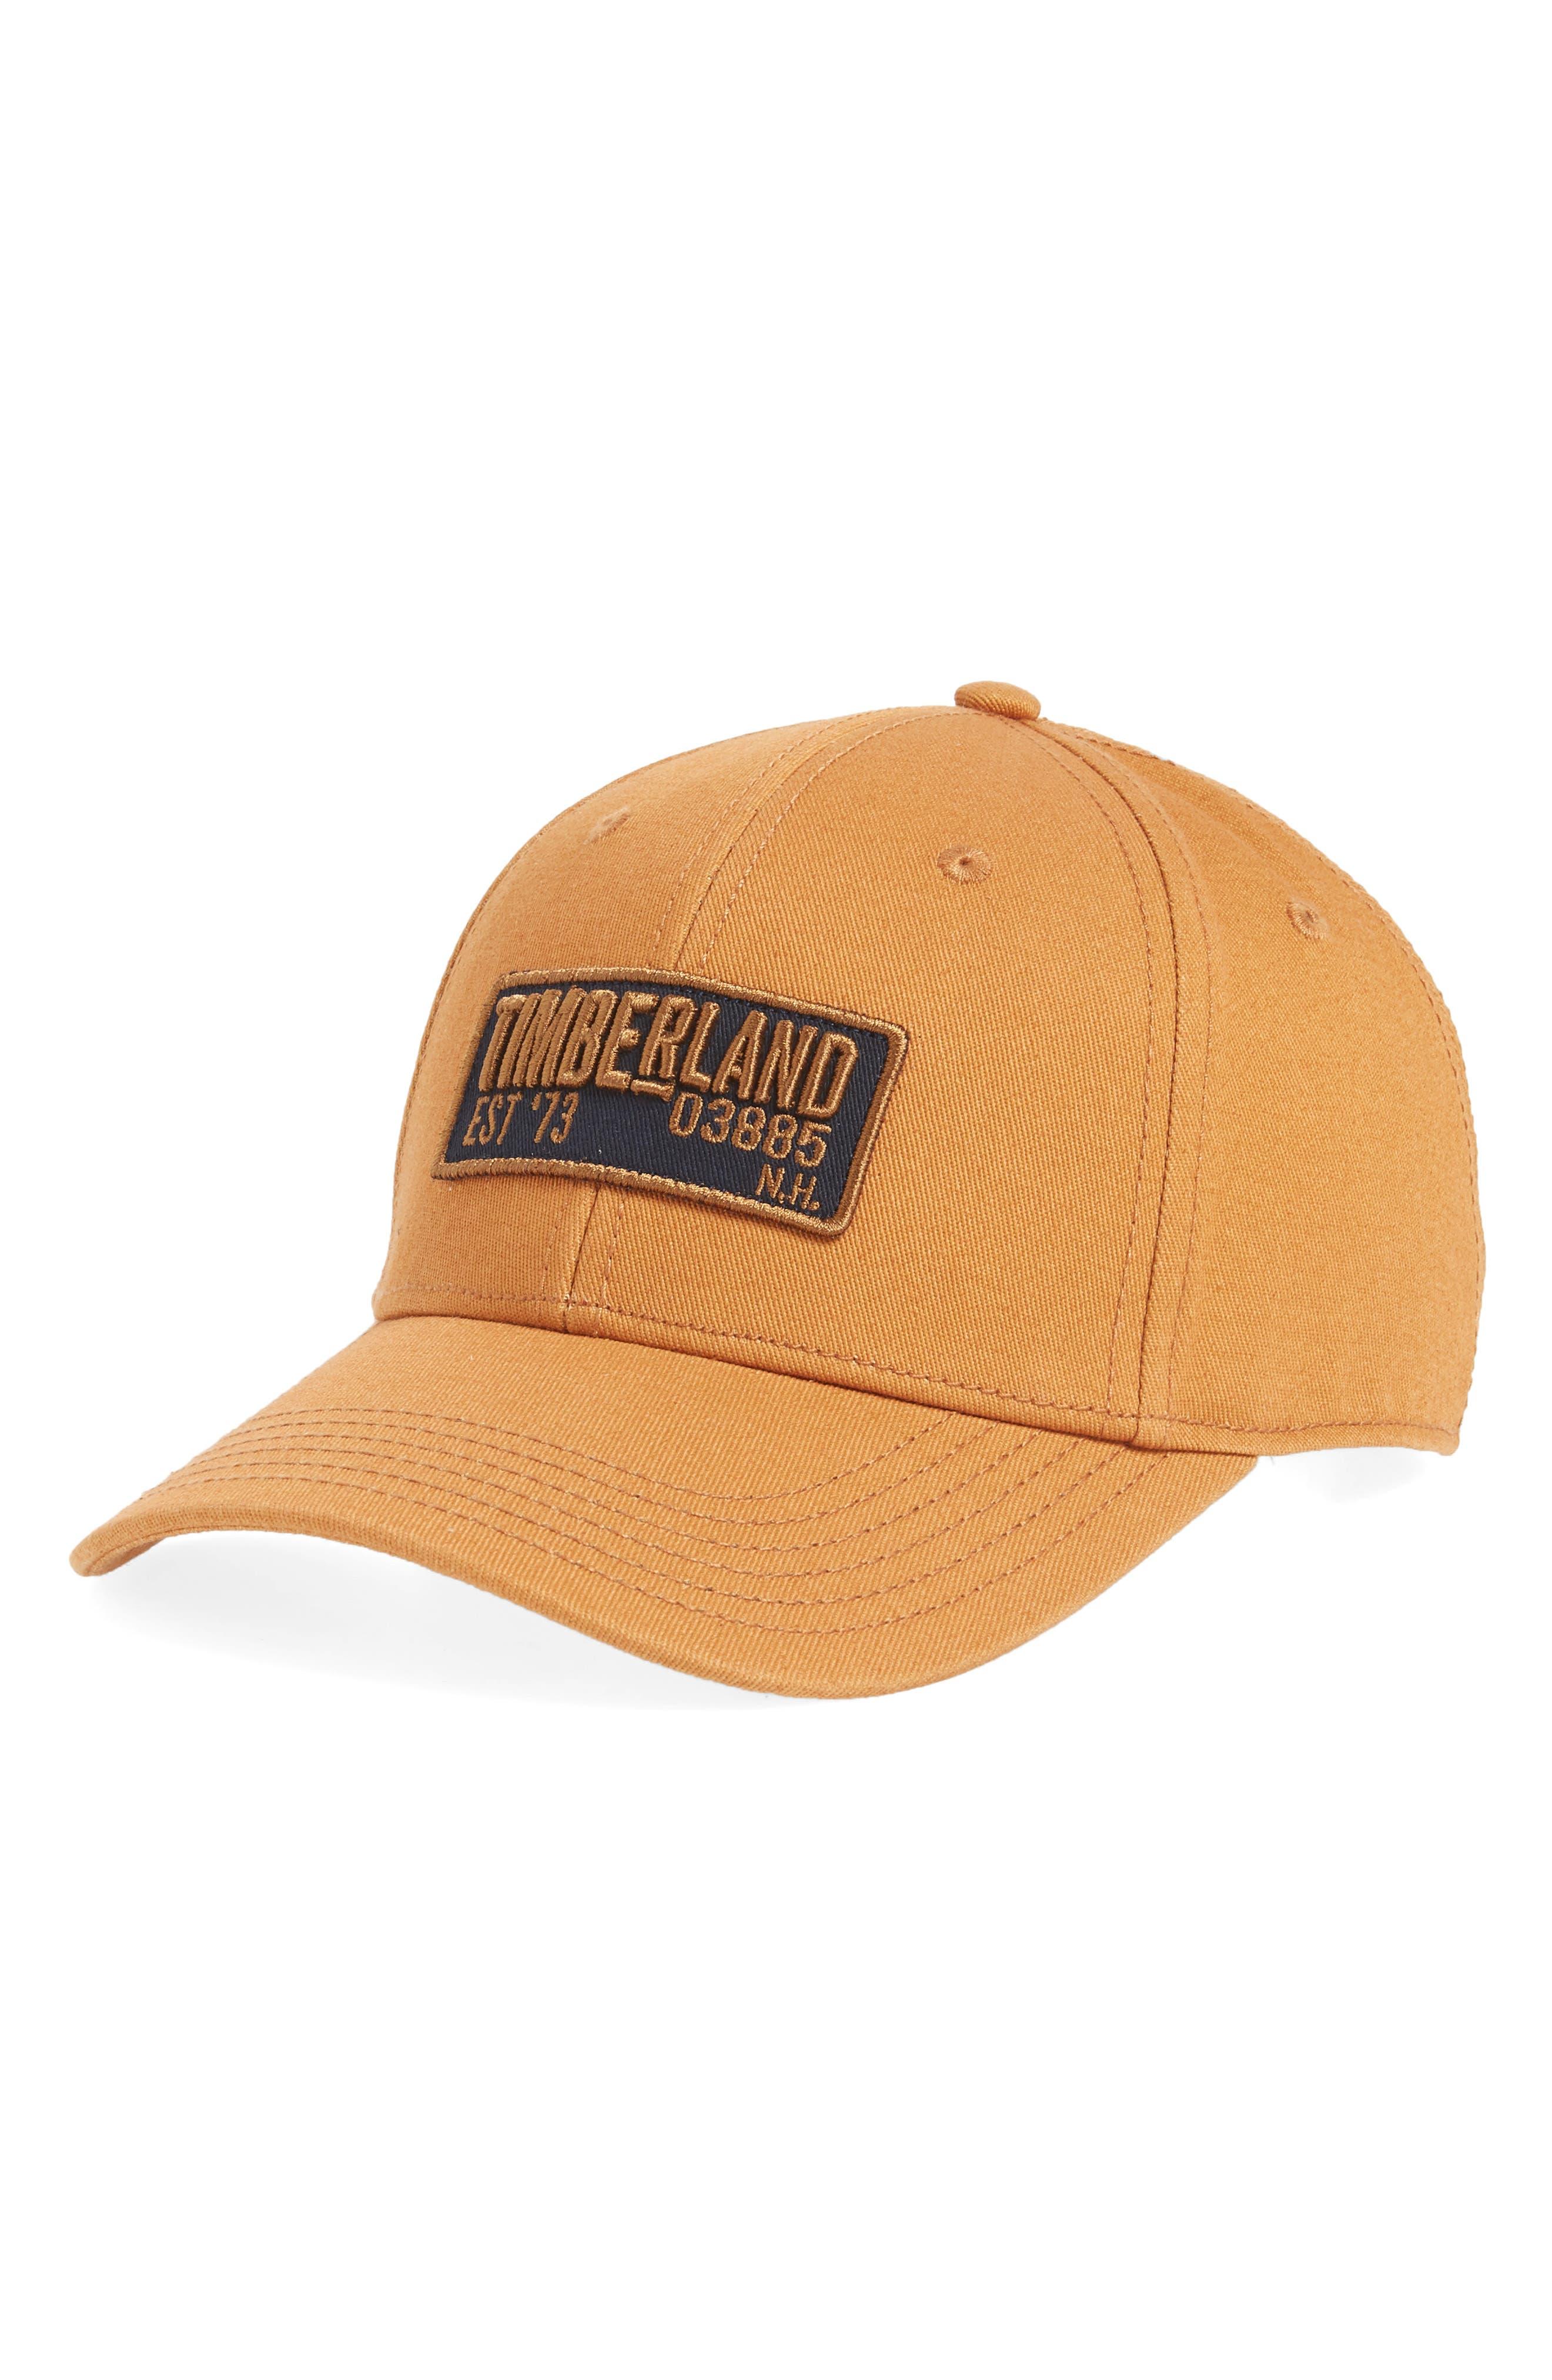 TIMBERLAND Kittery Baseball Cap, Main, color, WHEAT